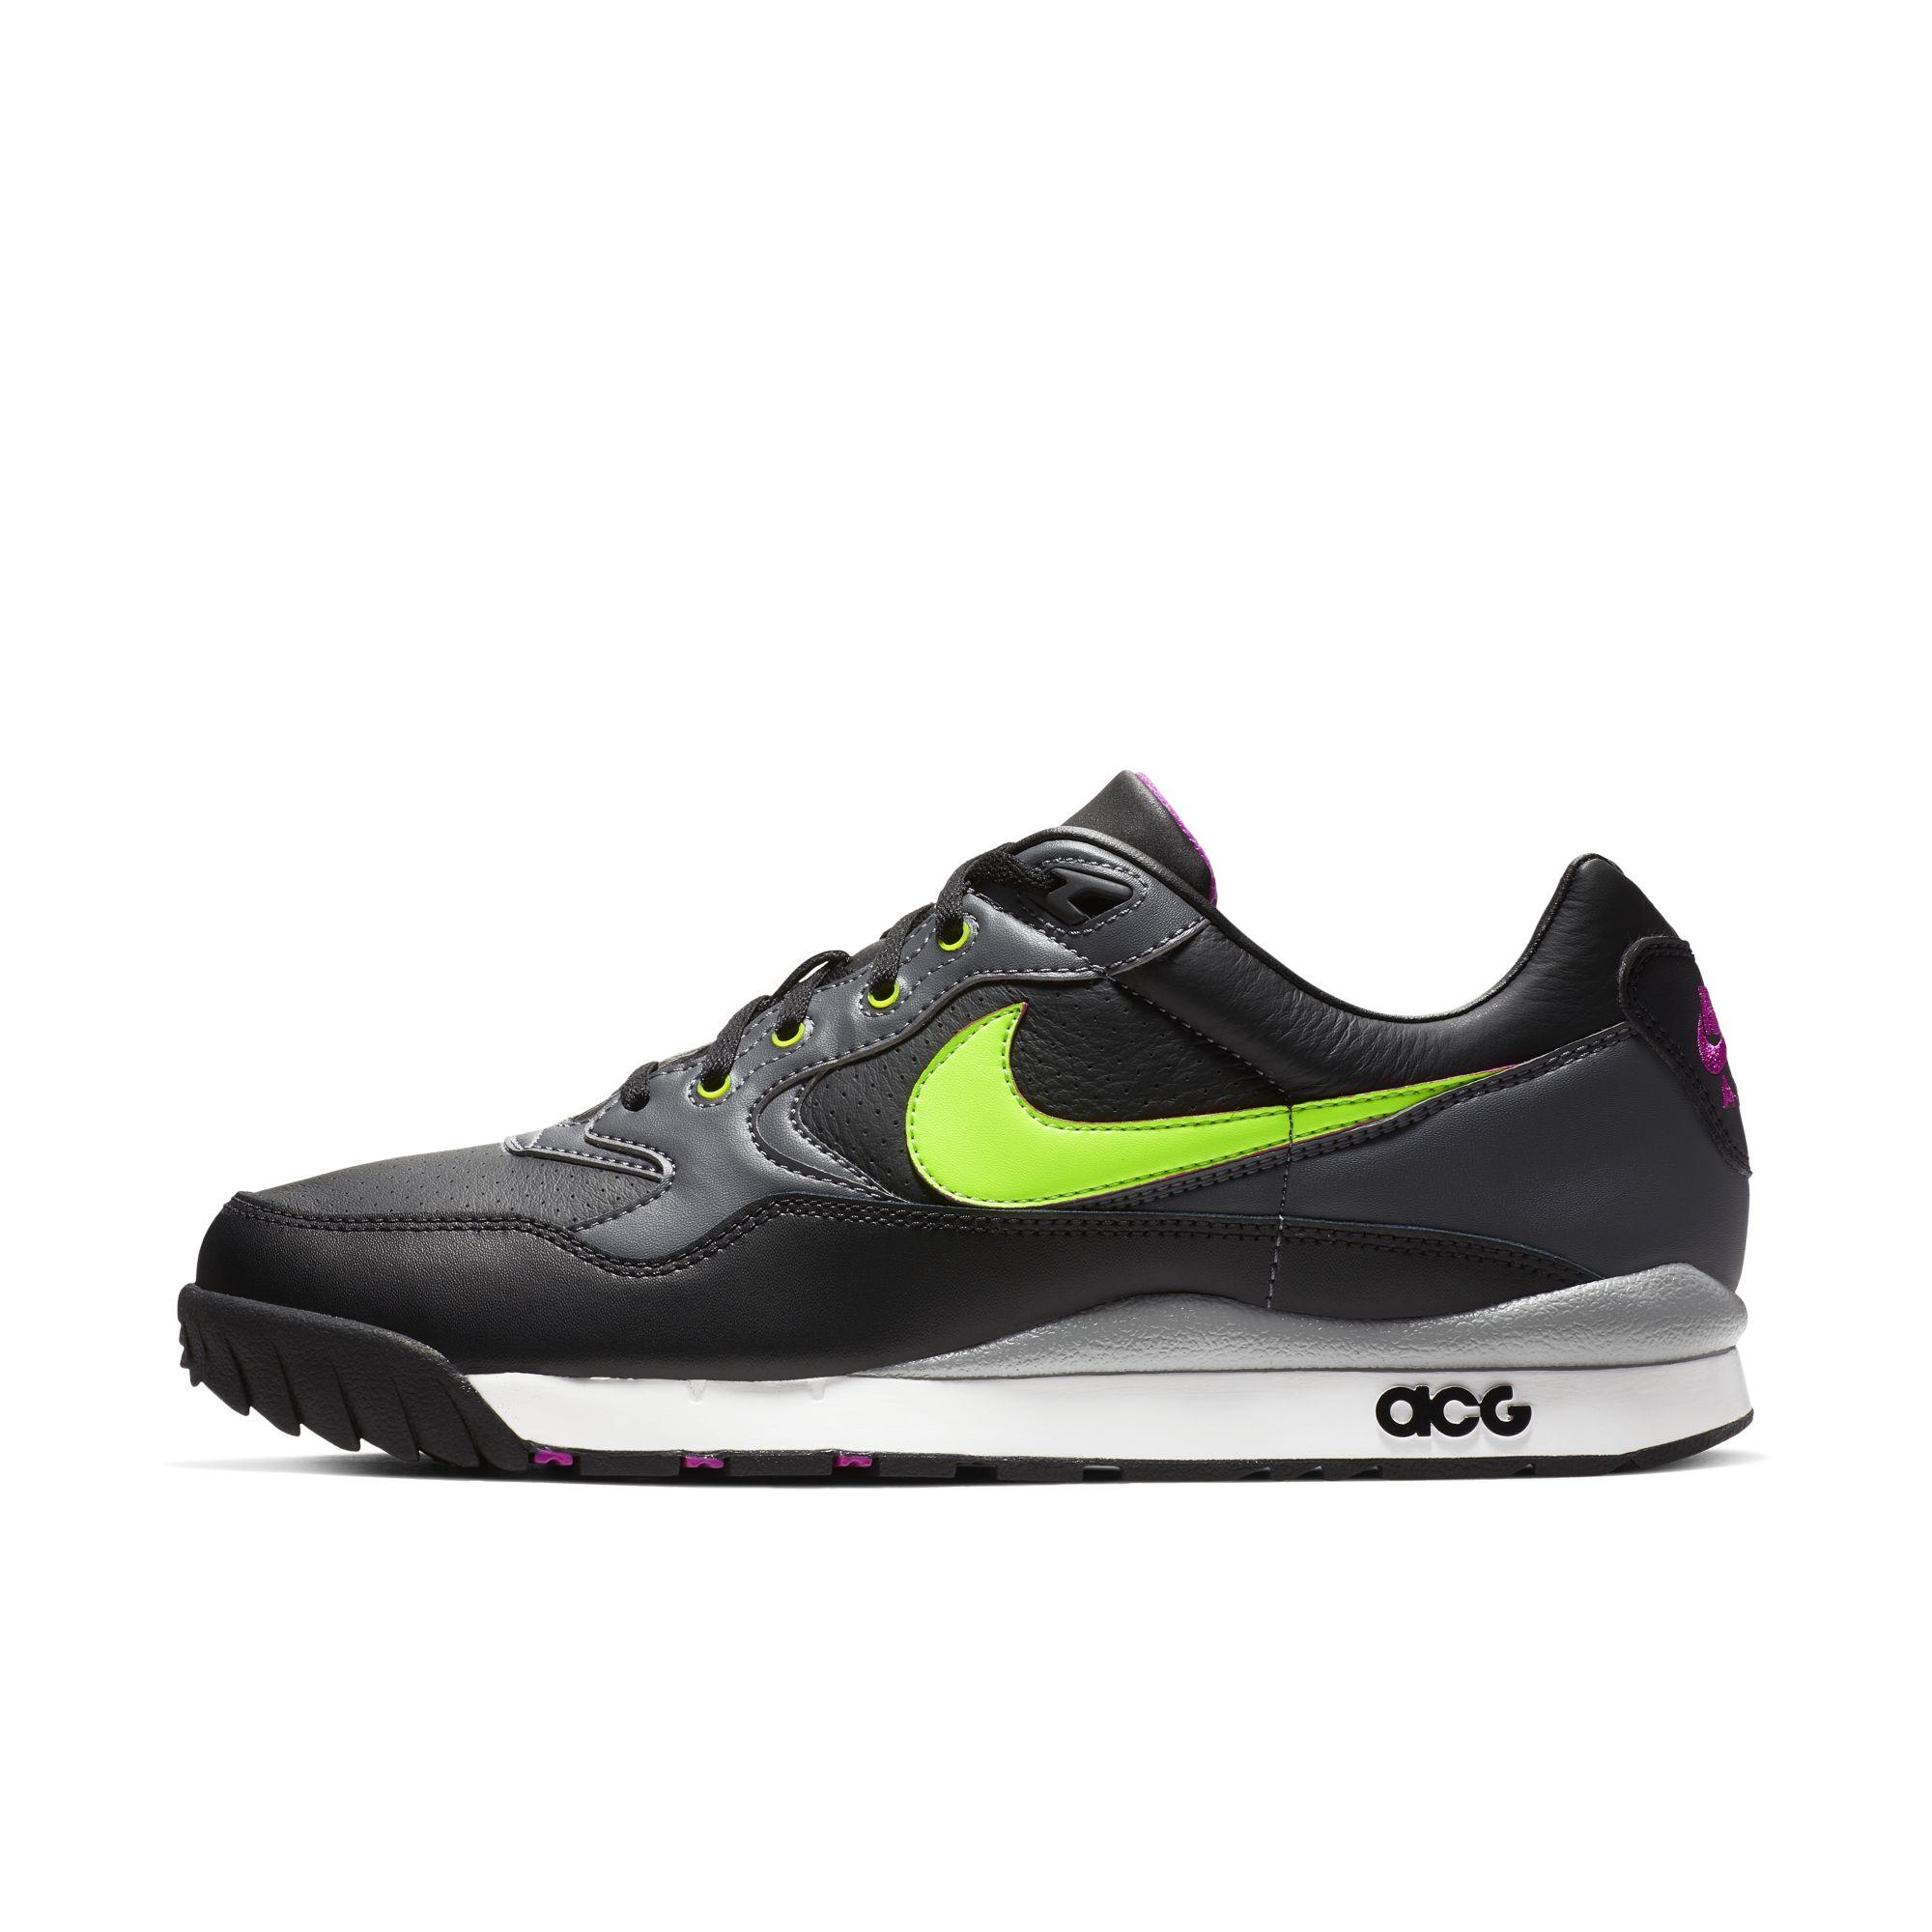 new arrivals c1fc9 a825f NIKE ACG thread   Page 77   NikeTalk